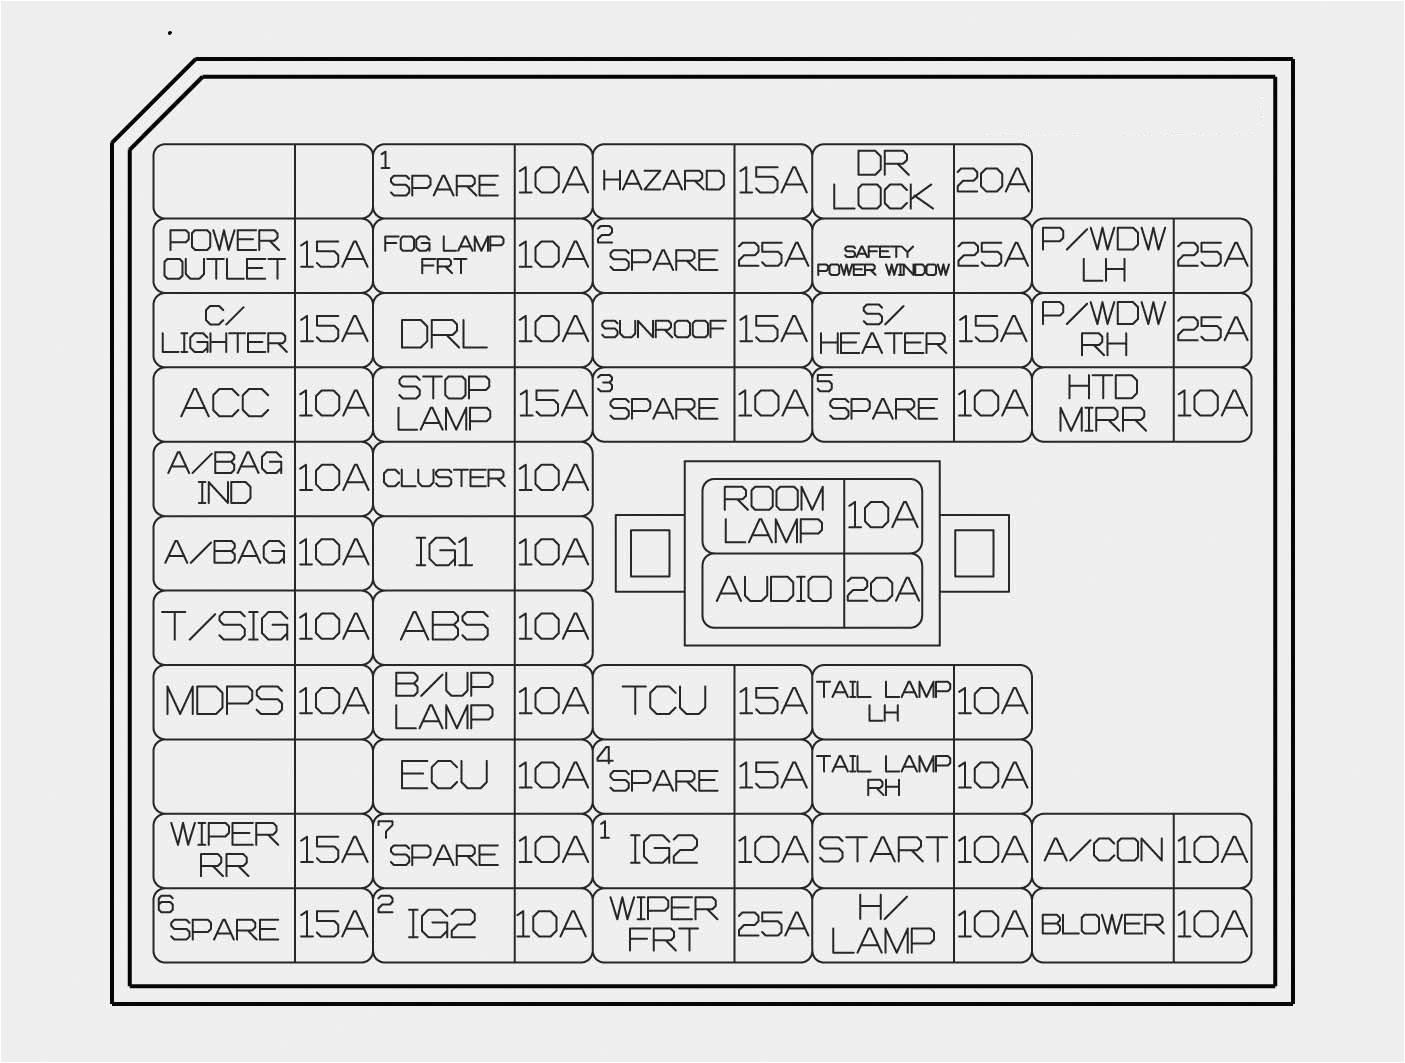 2009 hyundai sonata fuse box diagram wiring diagram used fuse box for 2004 hyundai sonata 2006